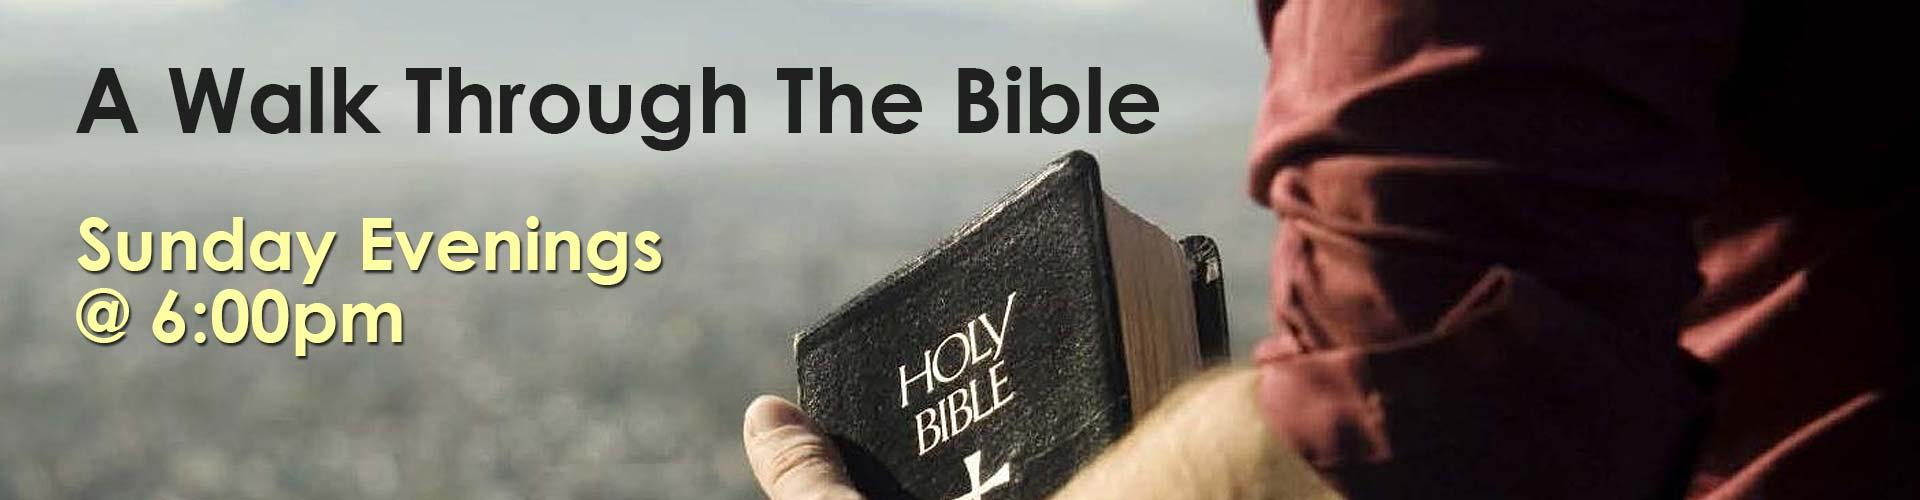 walk-through-the-bible